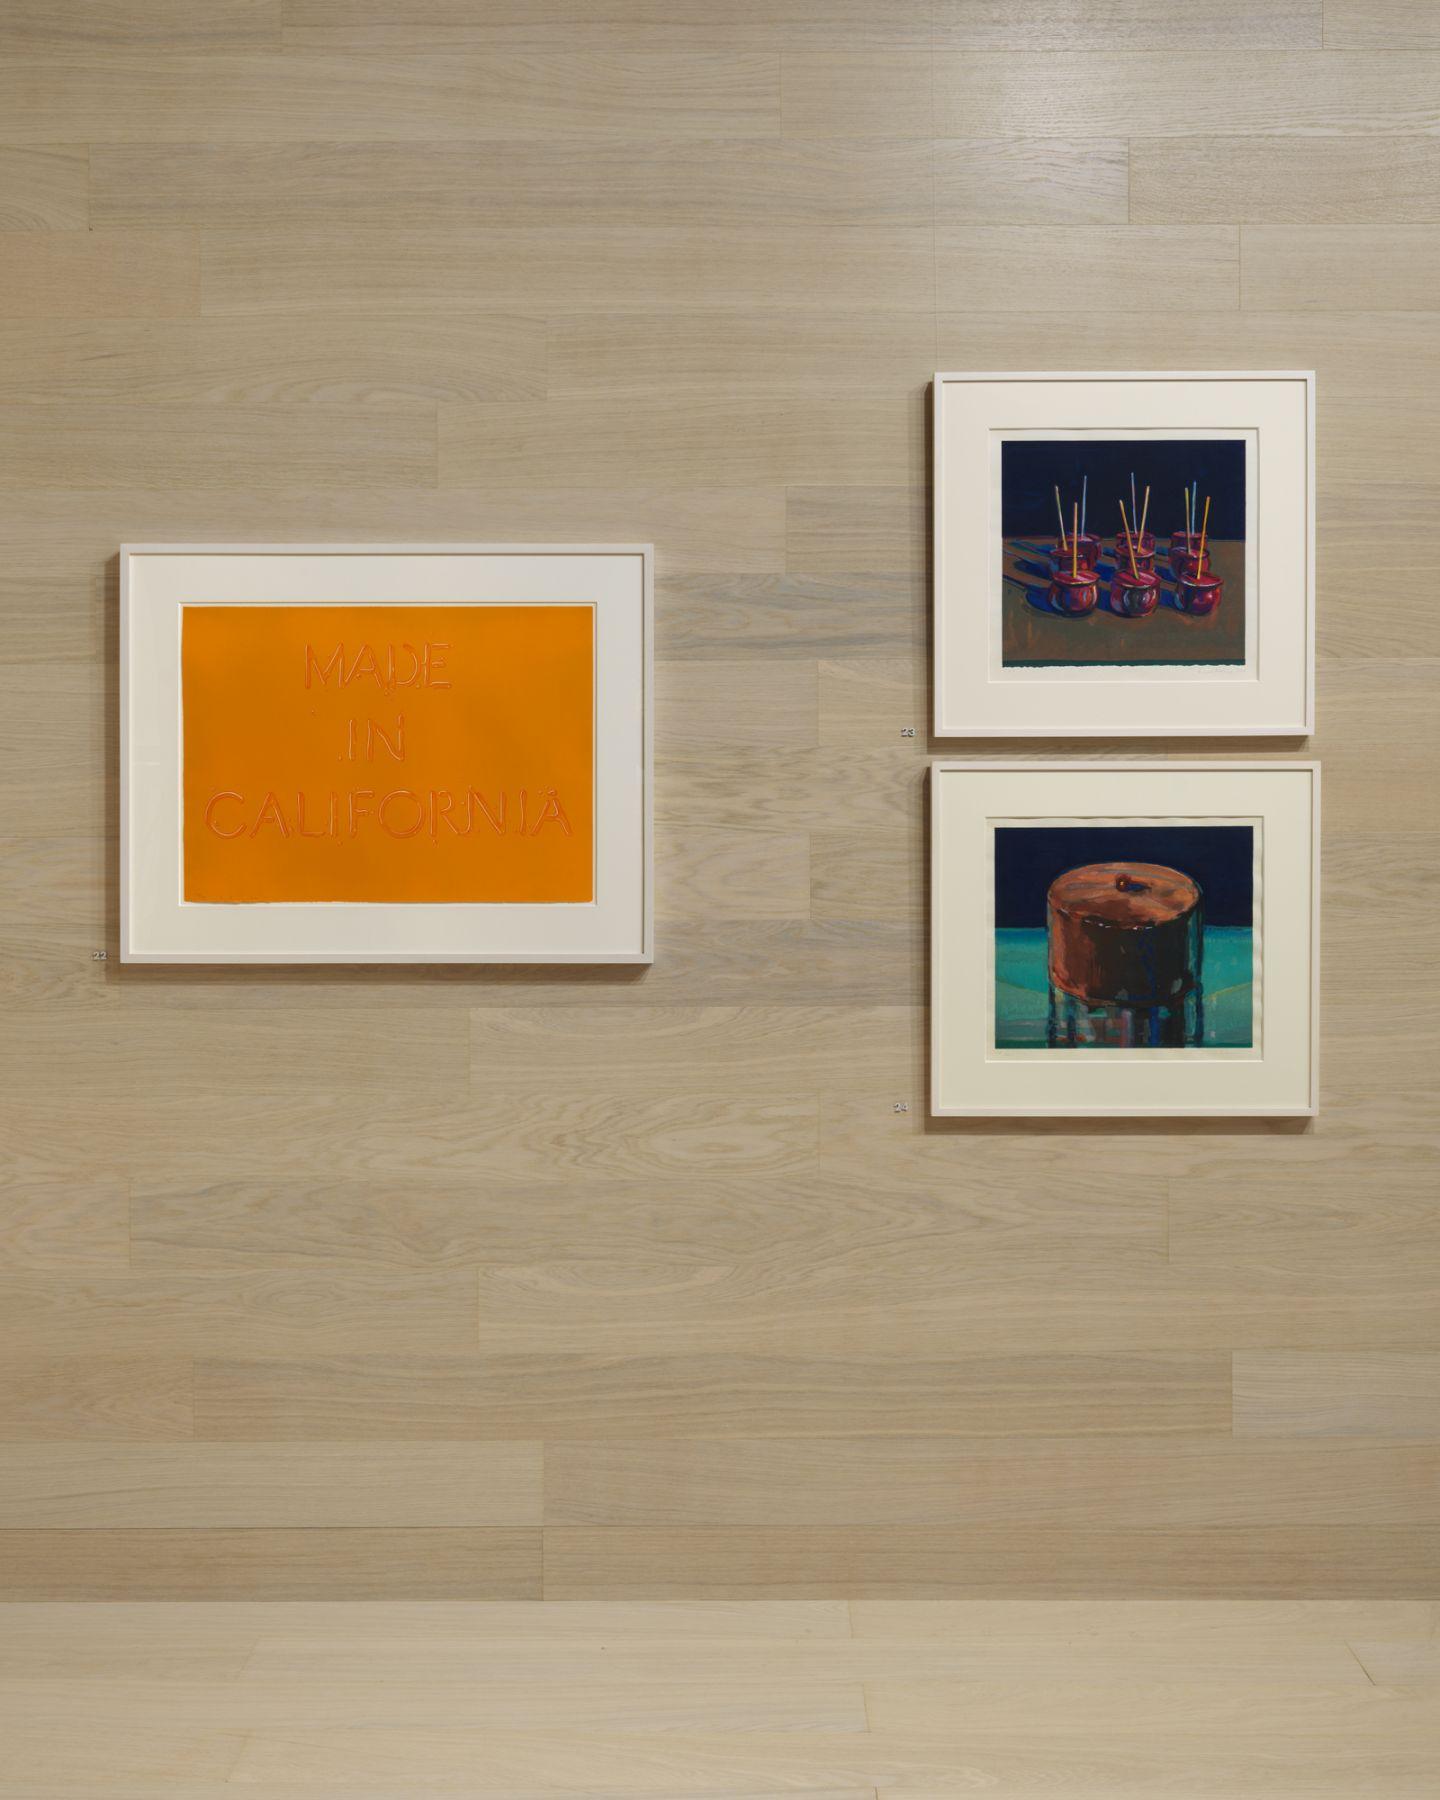 The Art Basel Miami Beach 2019 display at Susan Sheehan Gallery